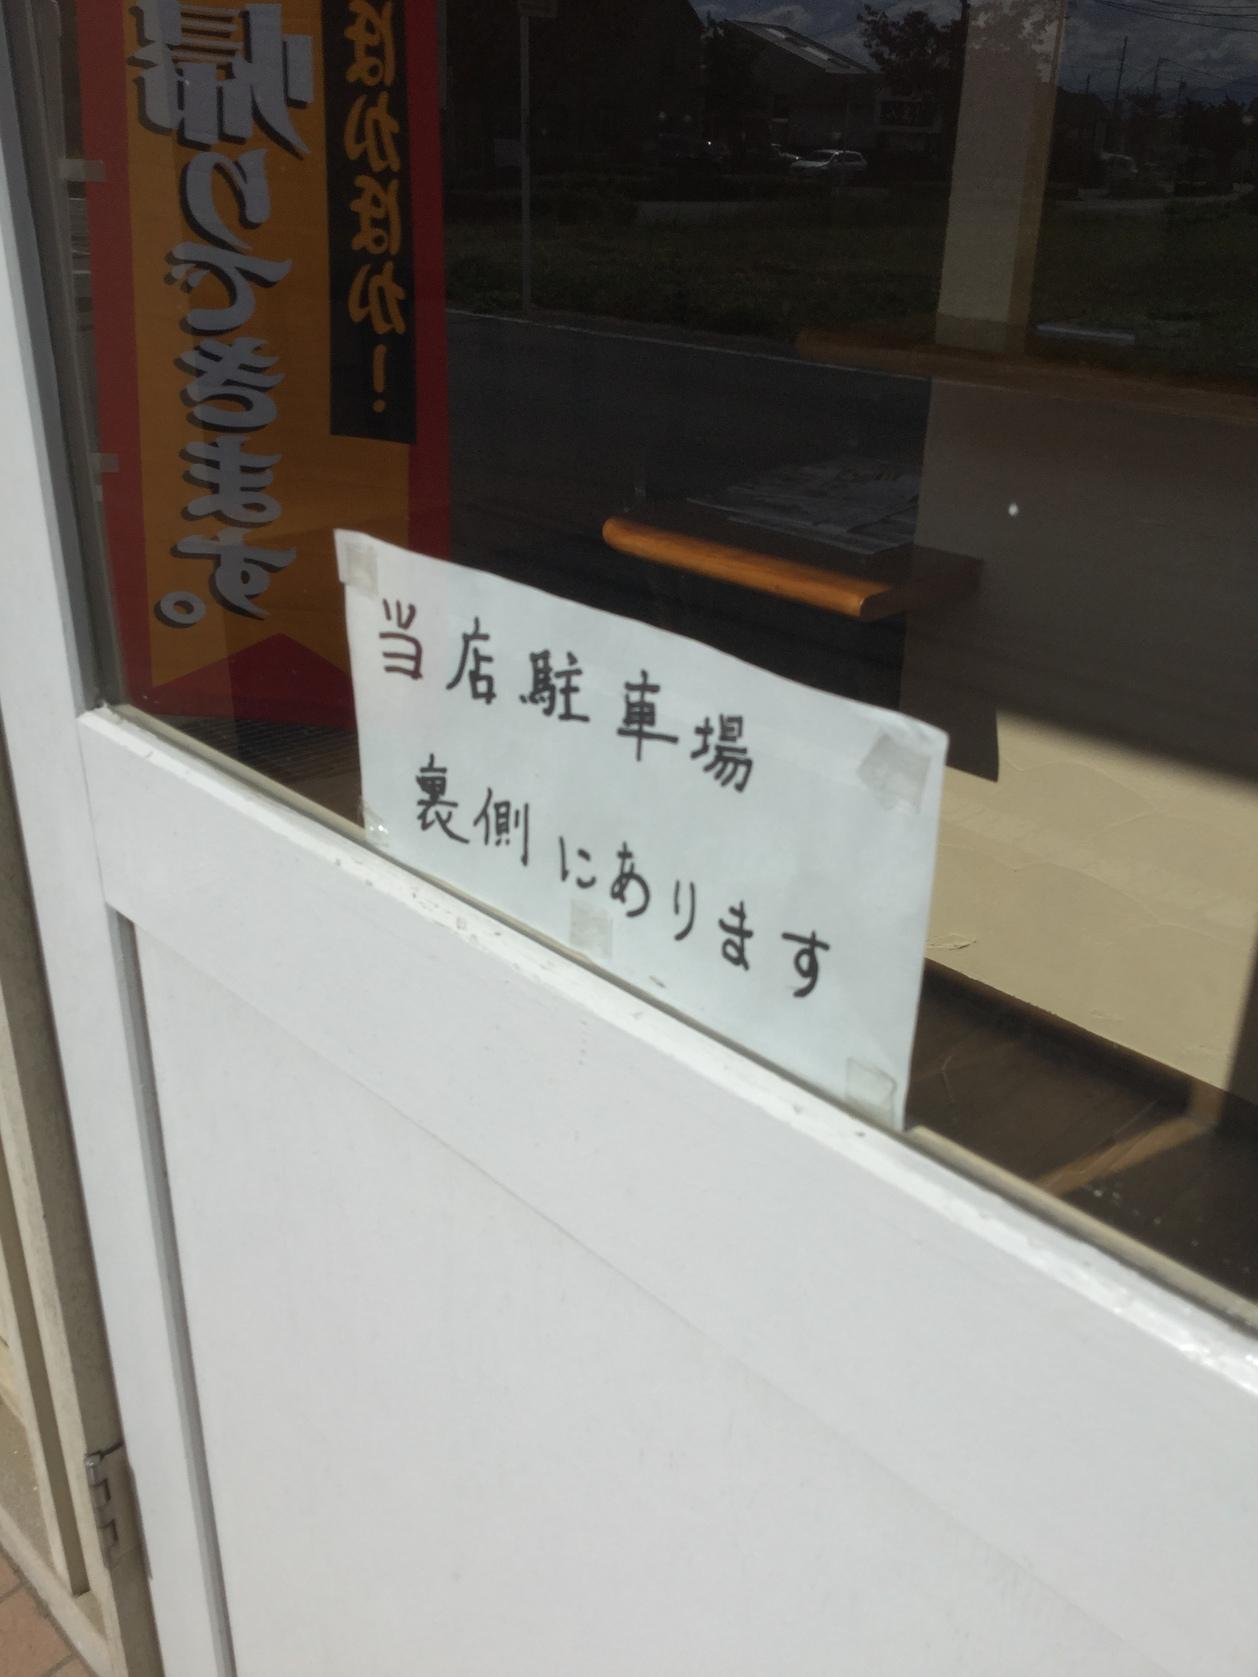 �n���o�[�O�� �O�������Ж{�X